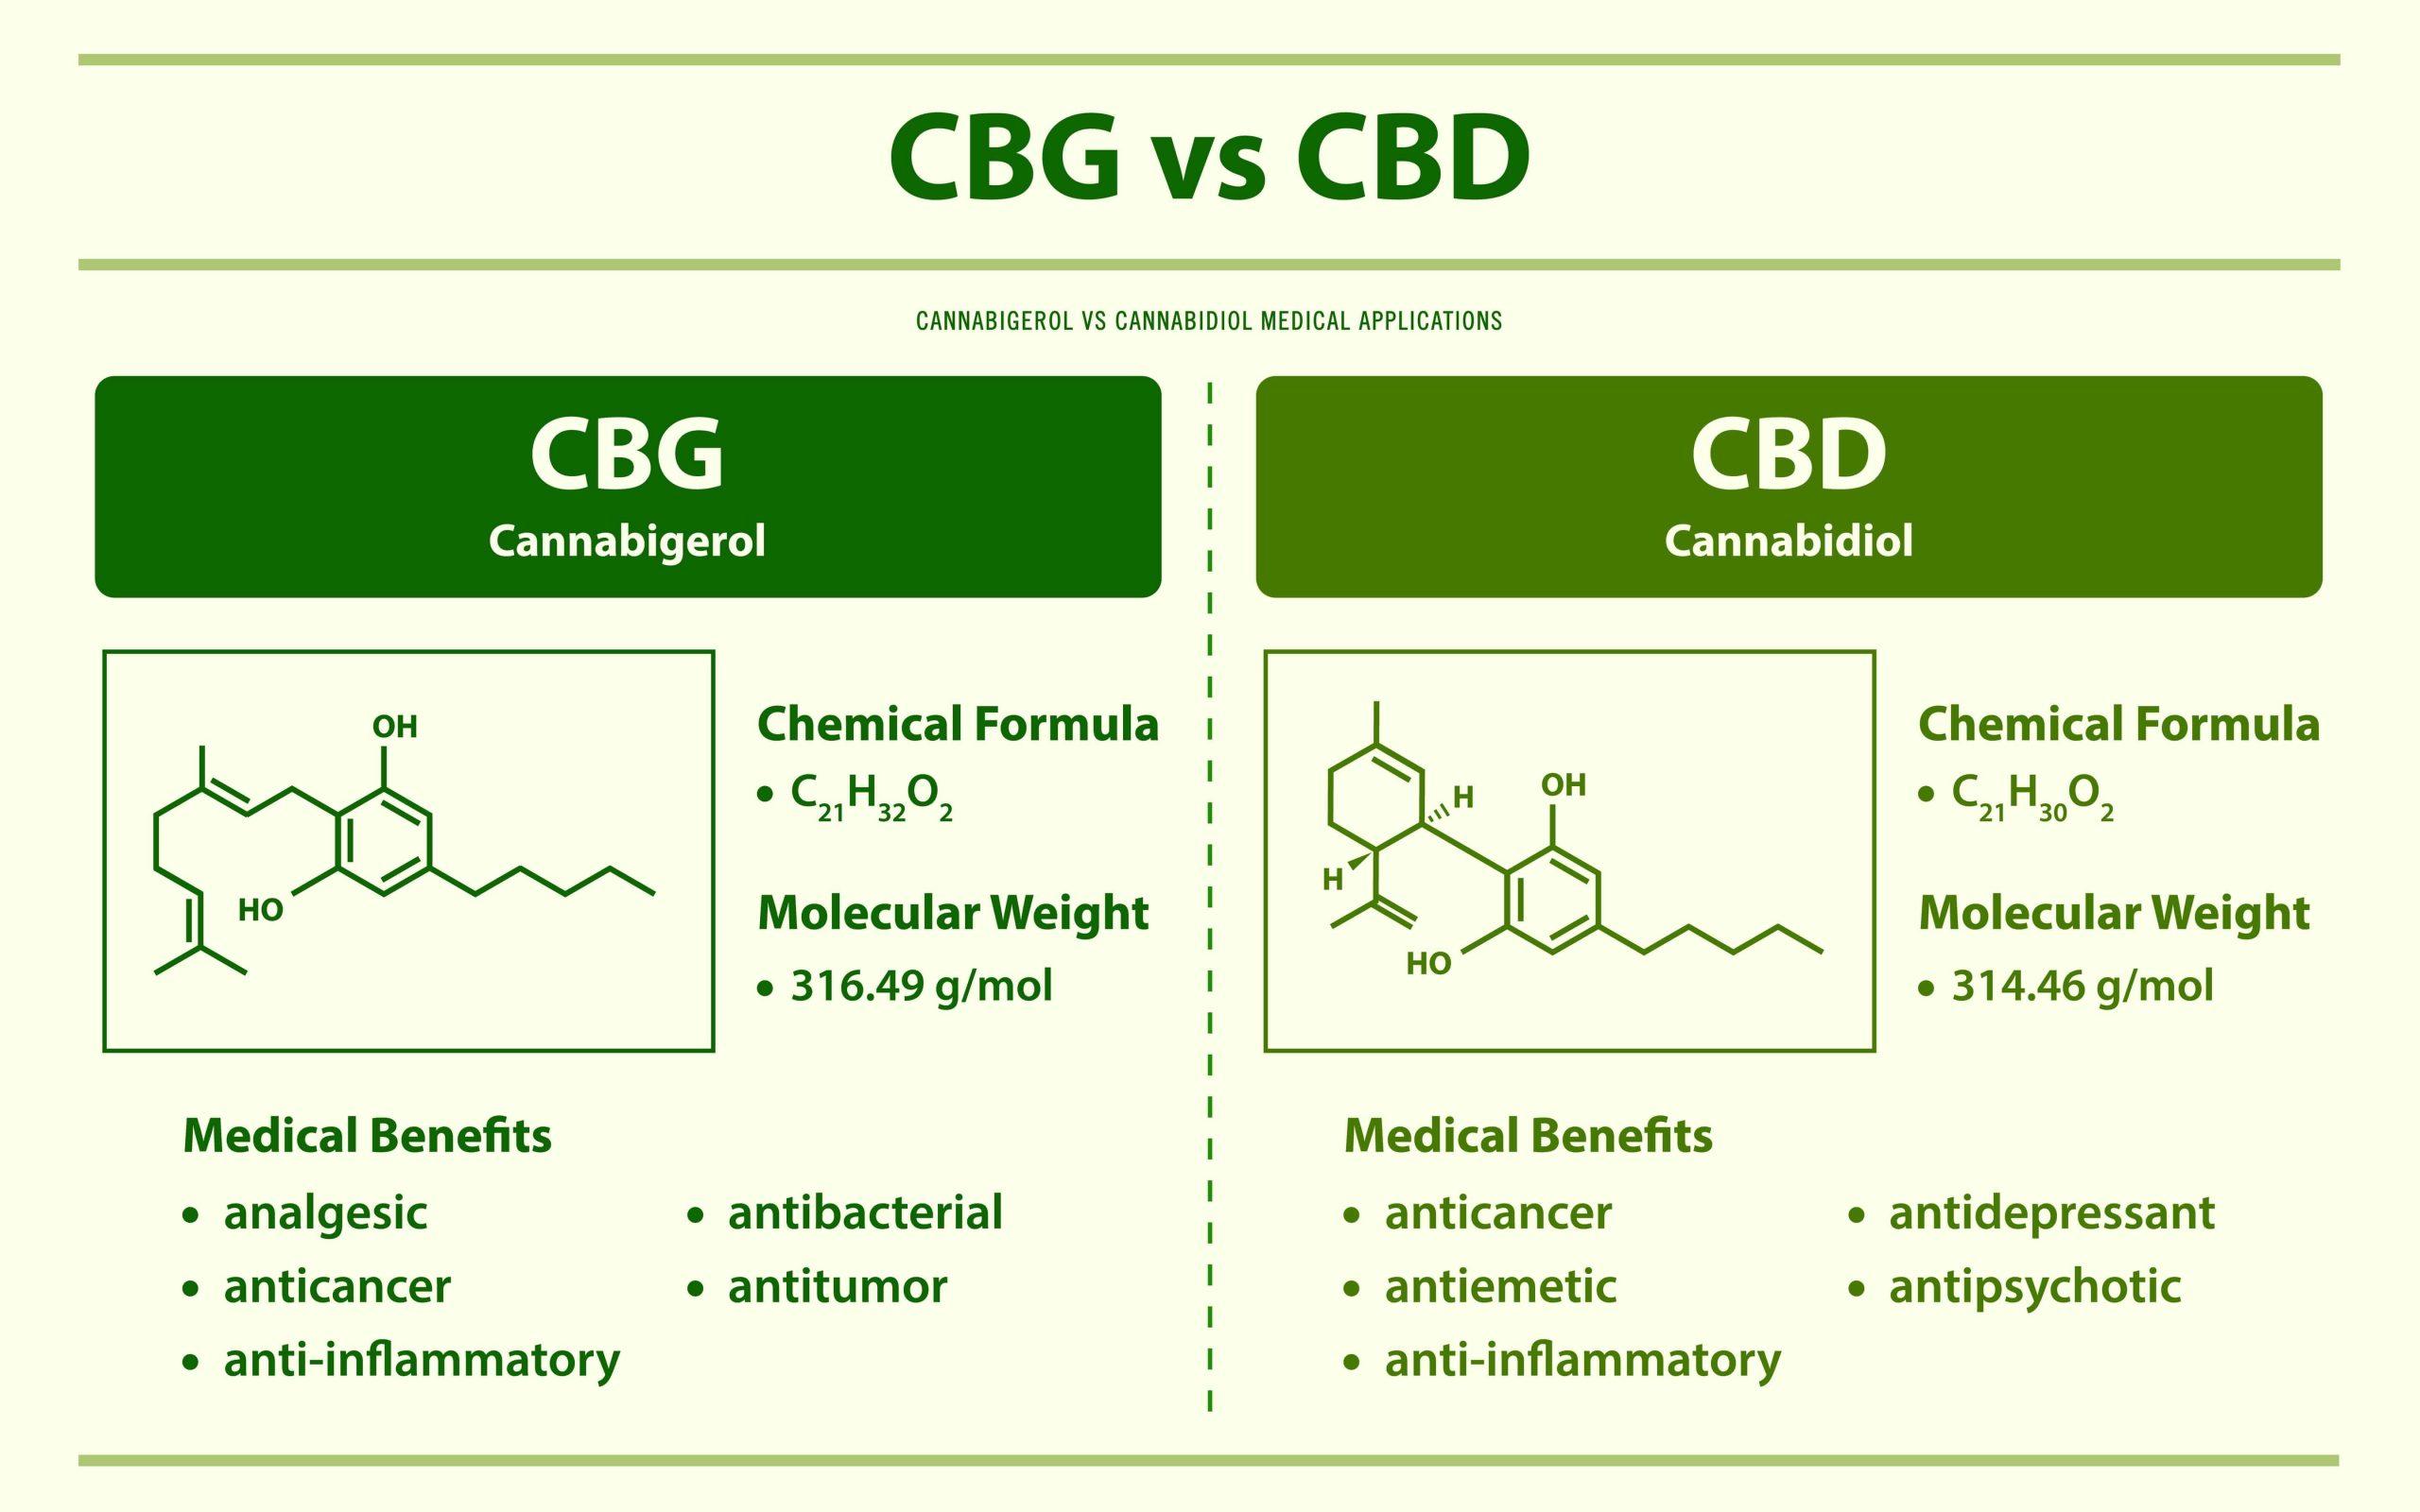 CBG vs CBD image